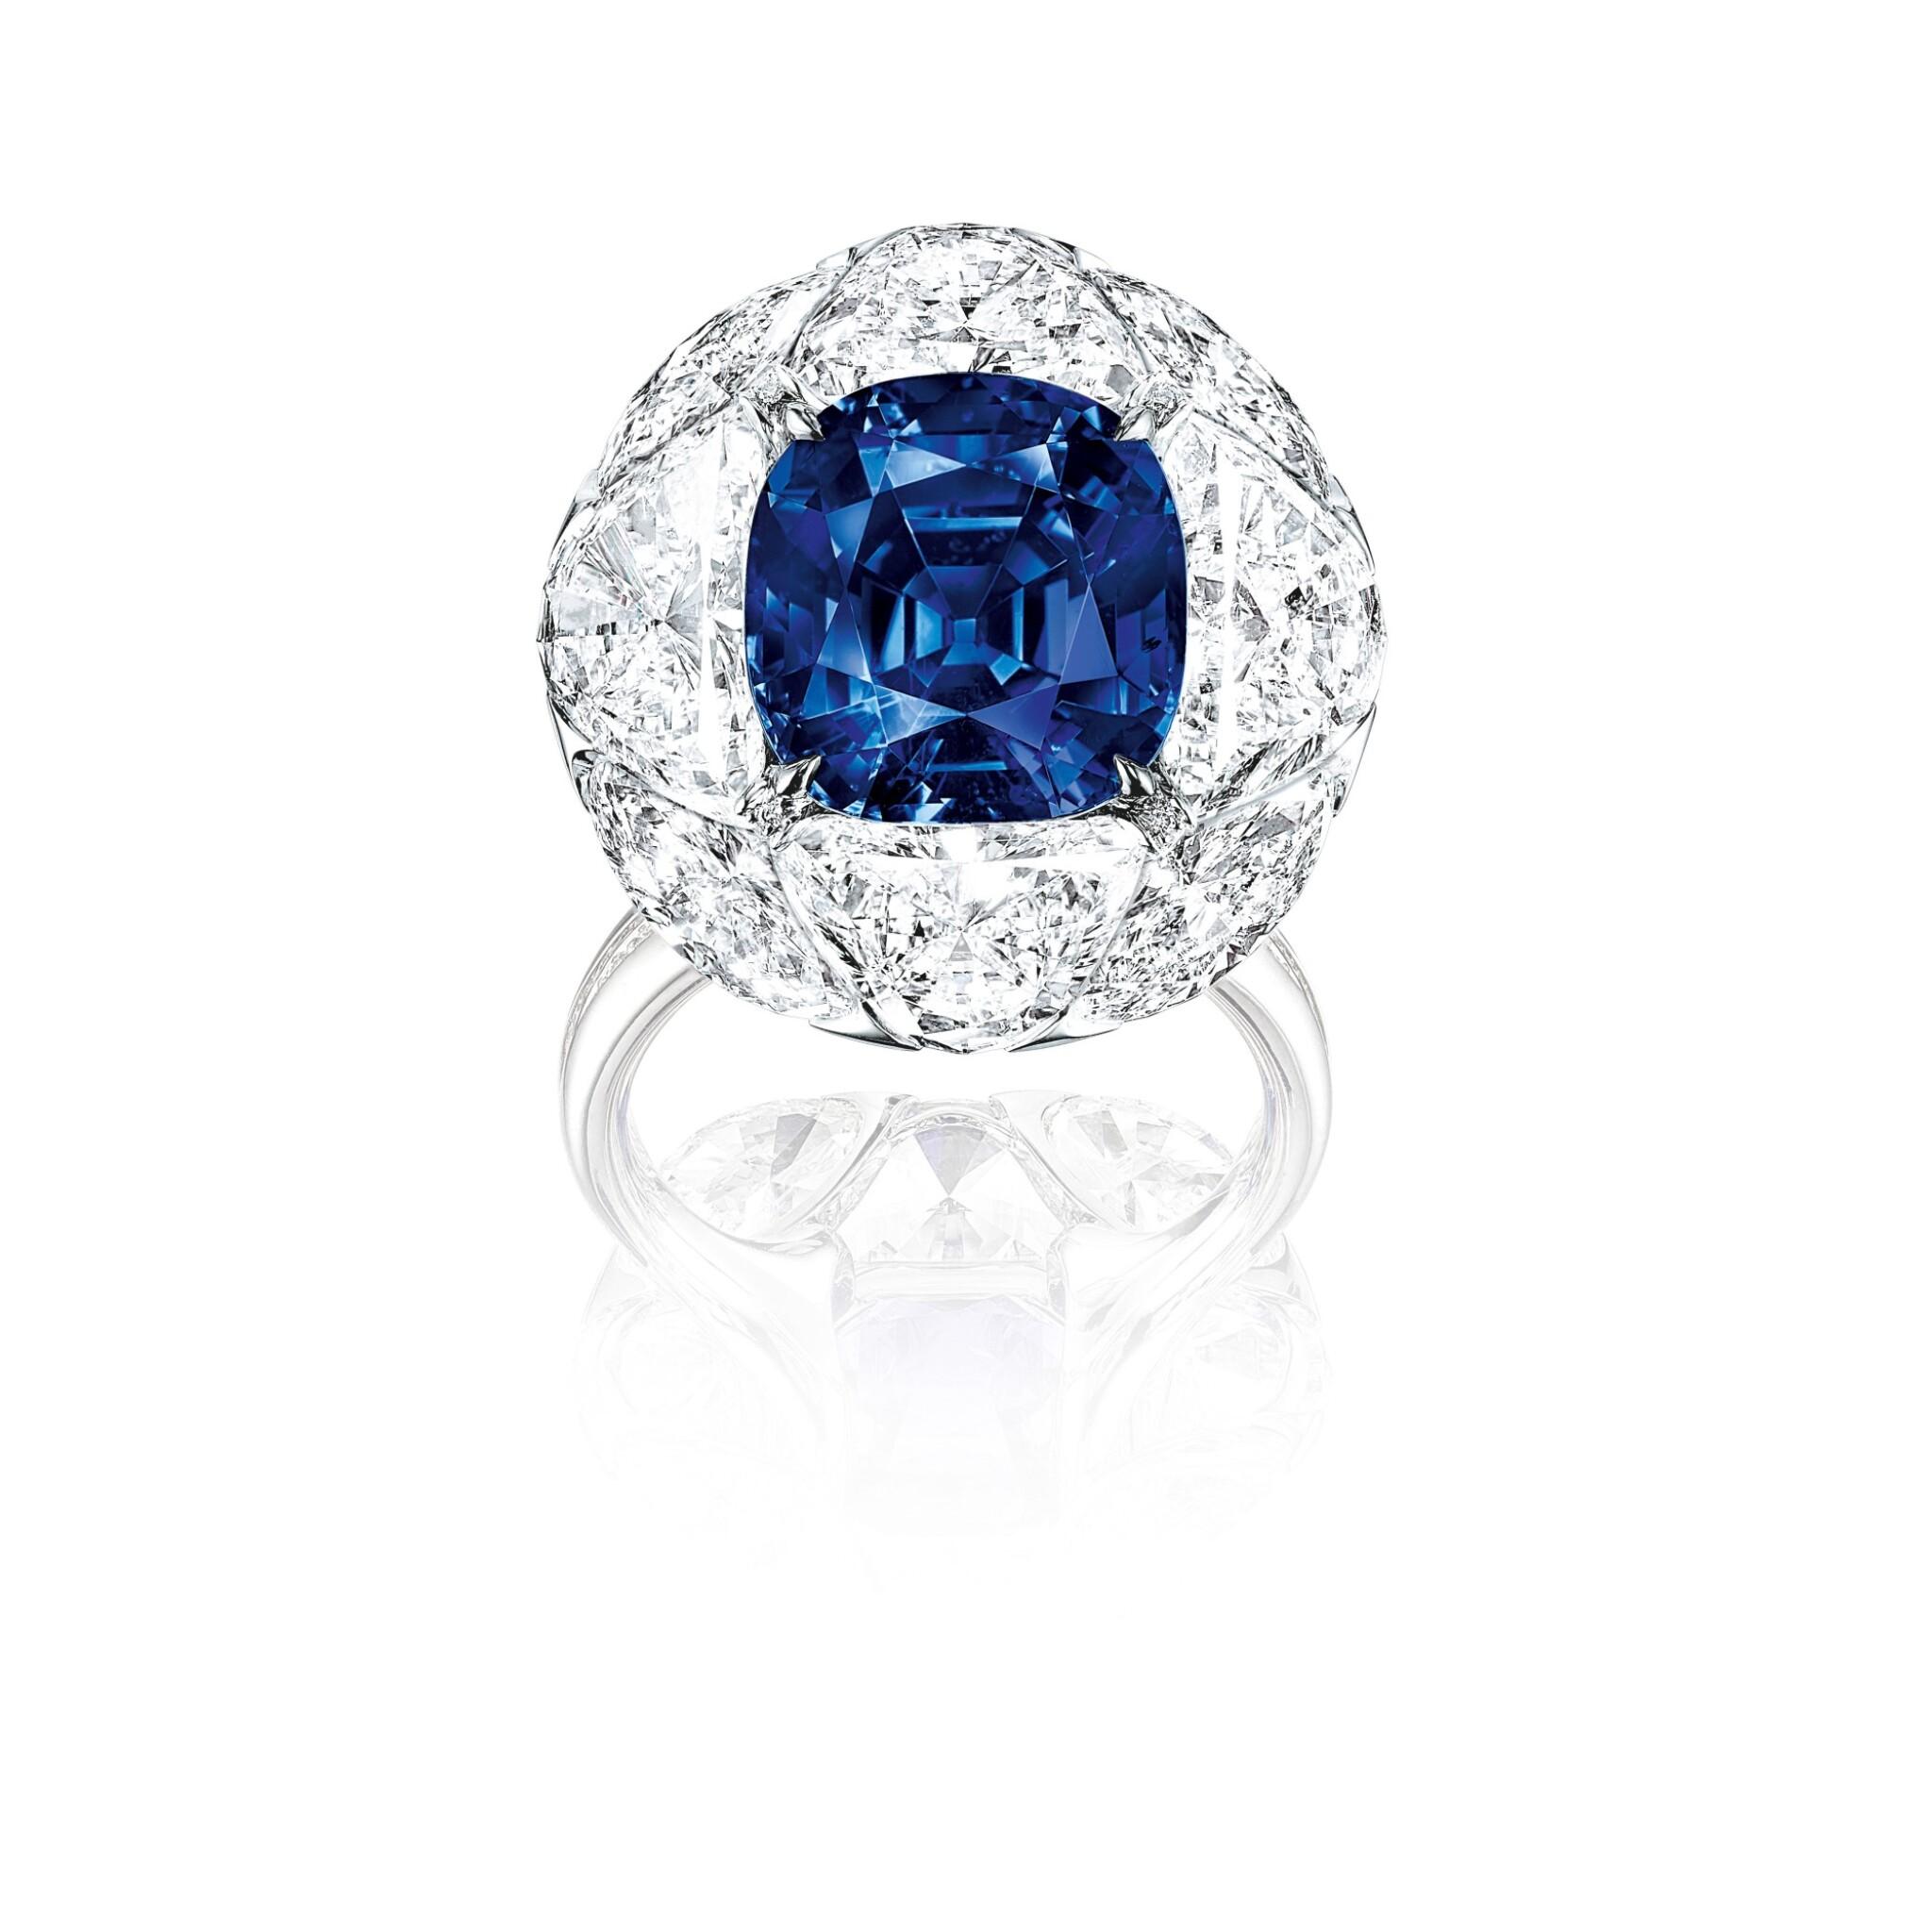 View full screen - View 1 of Lot 1741. FORMS | SAPPHIRE AND DIAMOND RING | FORMS | 7.95卡拉 天然「緬甸皇家藍」未經加熱藍寶石 配 鑽石 戒指.